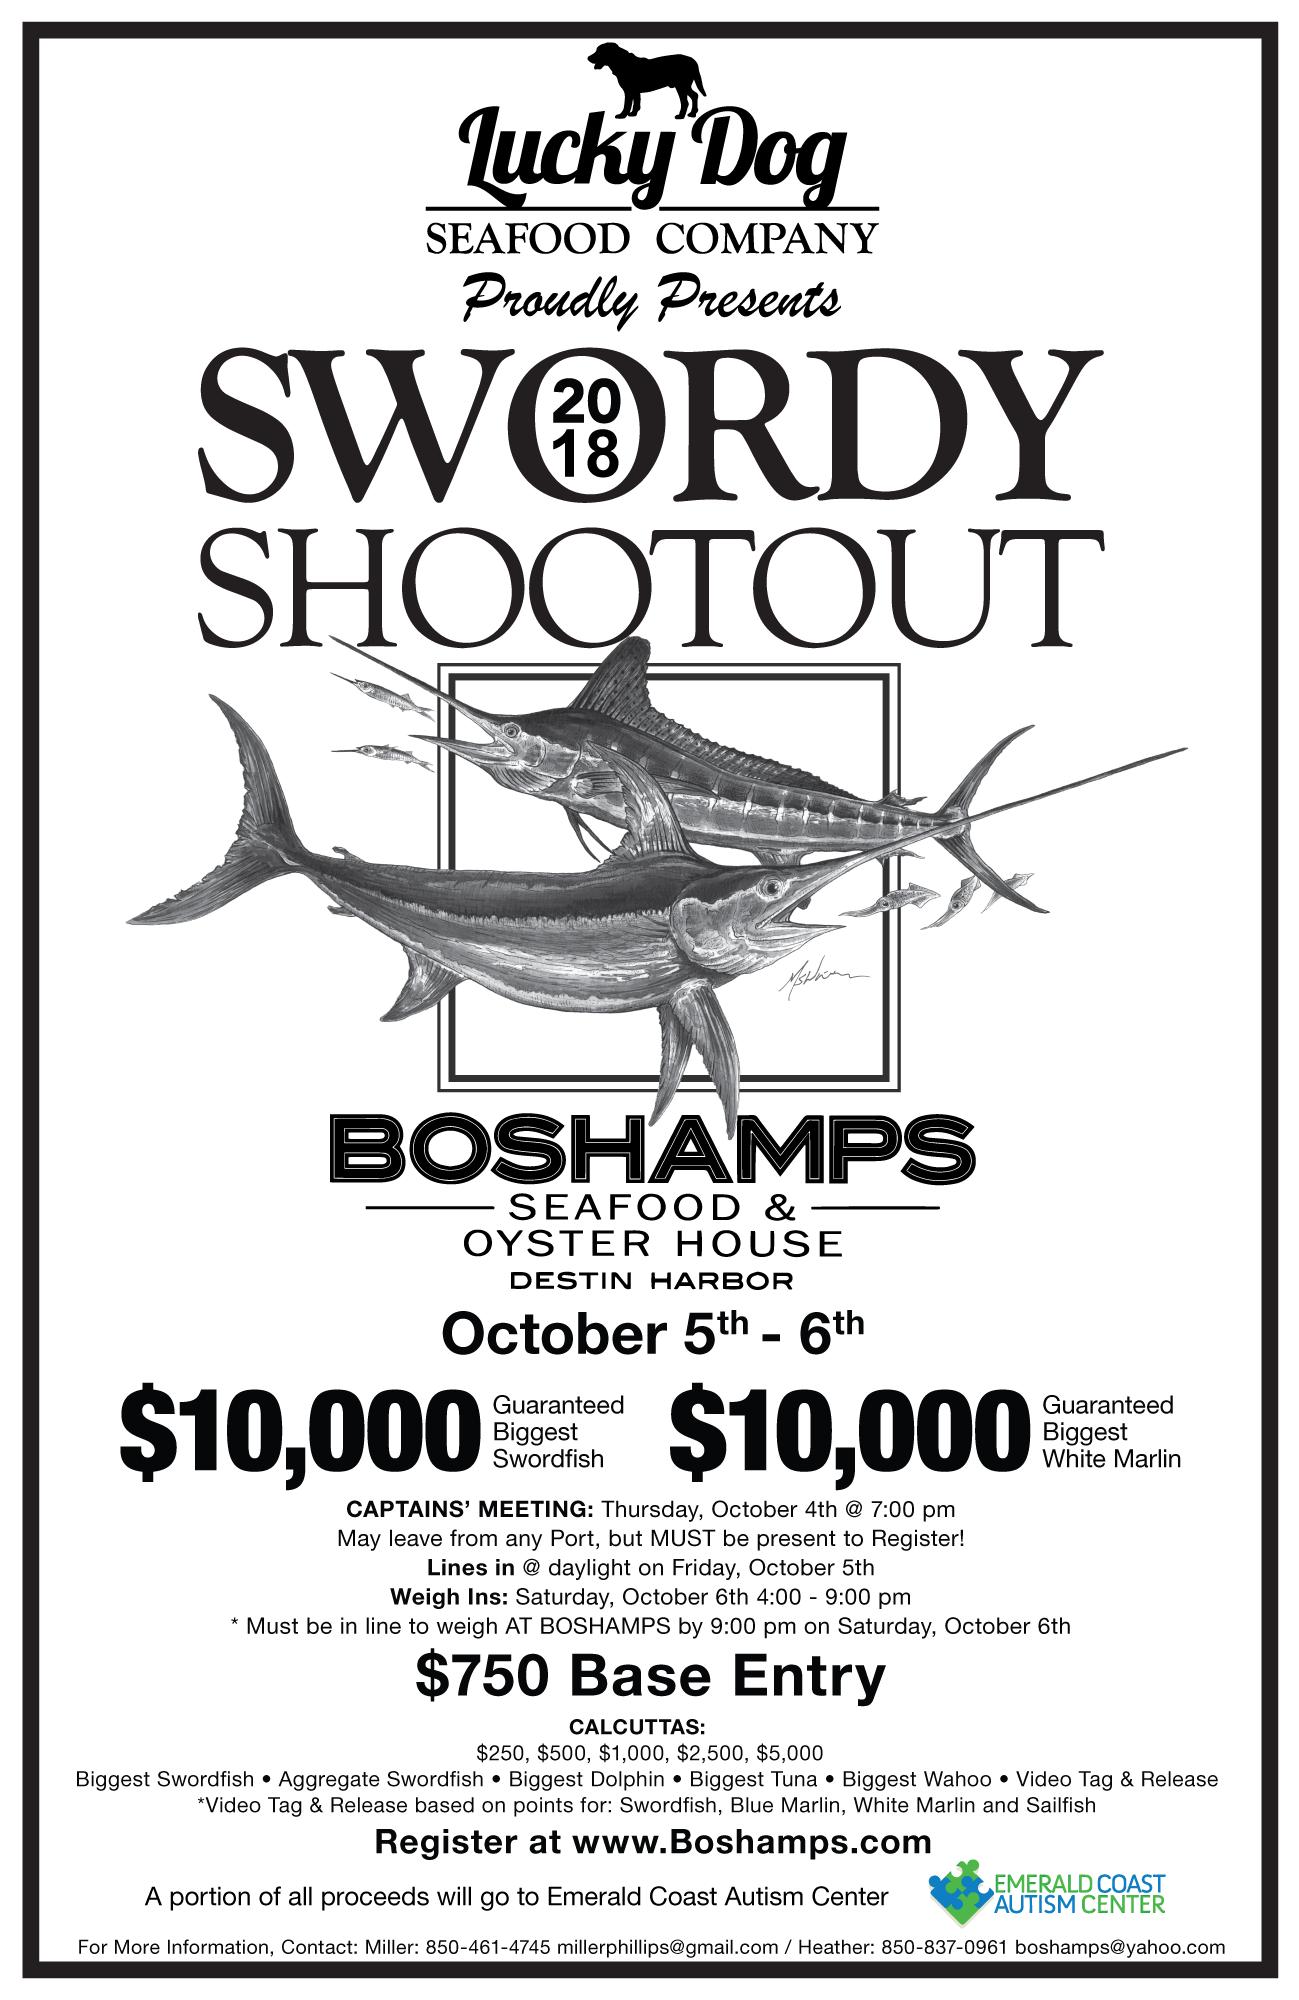 Boshamps Presents 3rd Annual Swordy Shootout